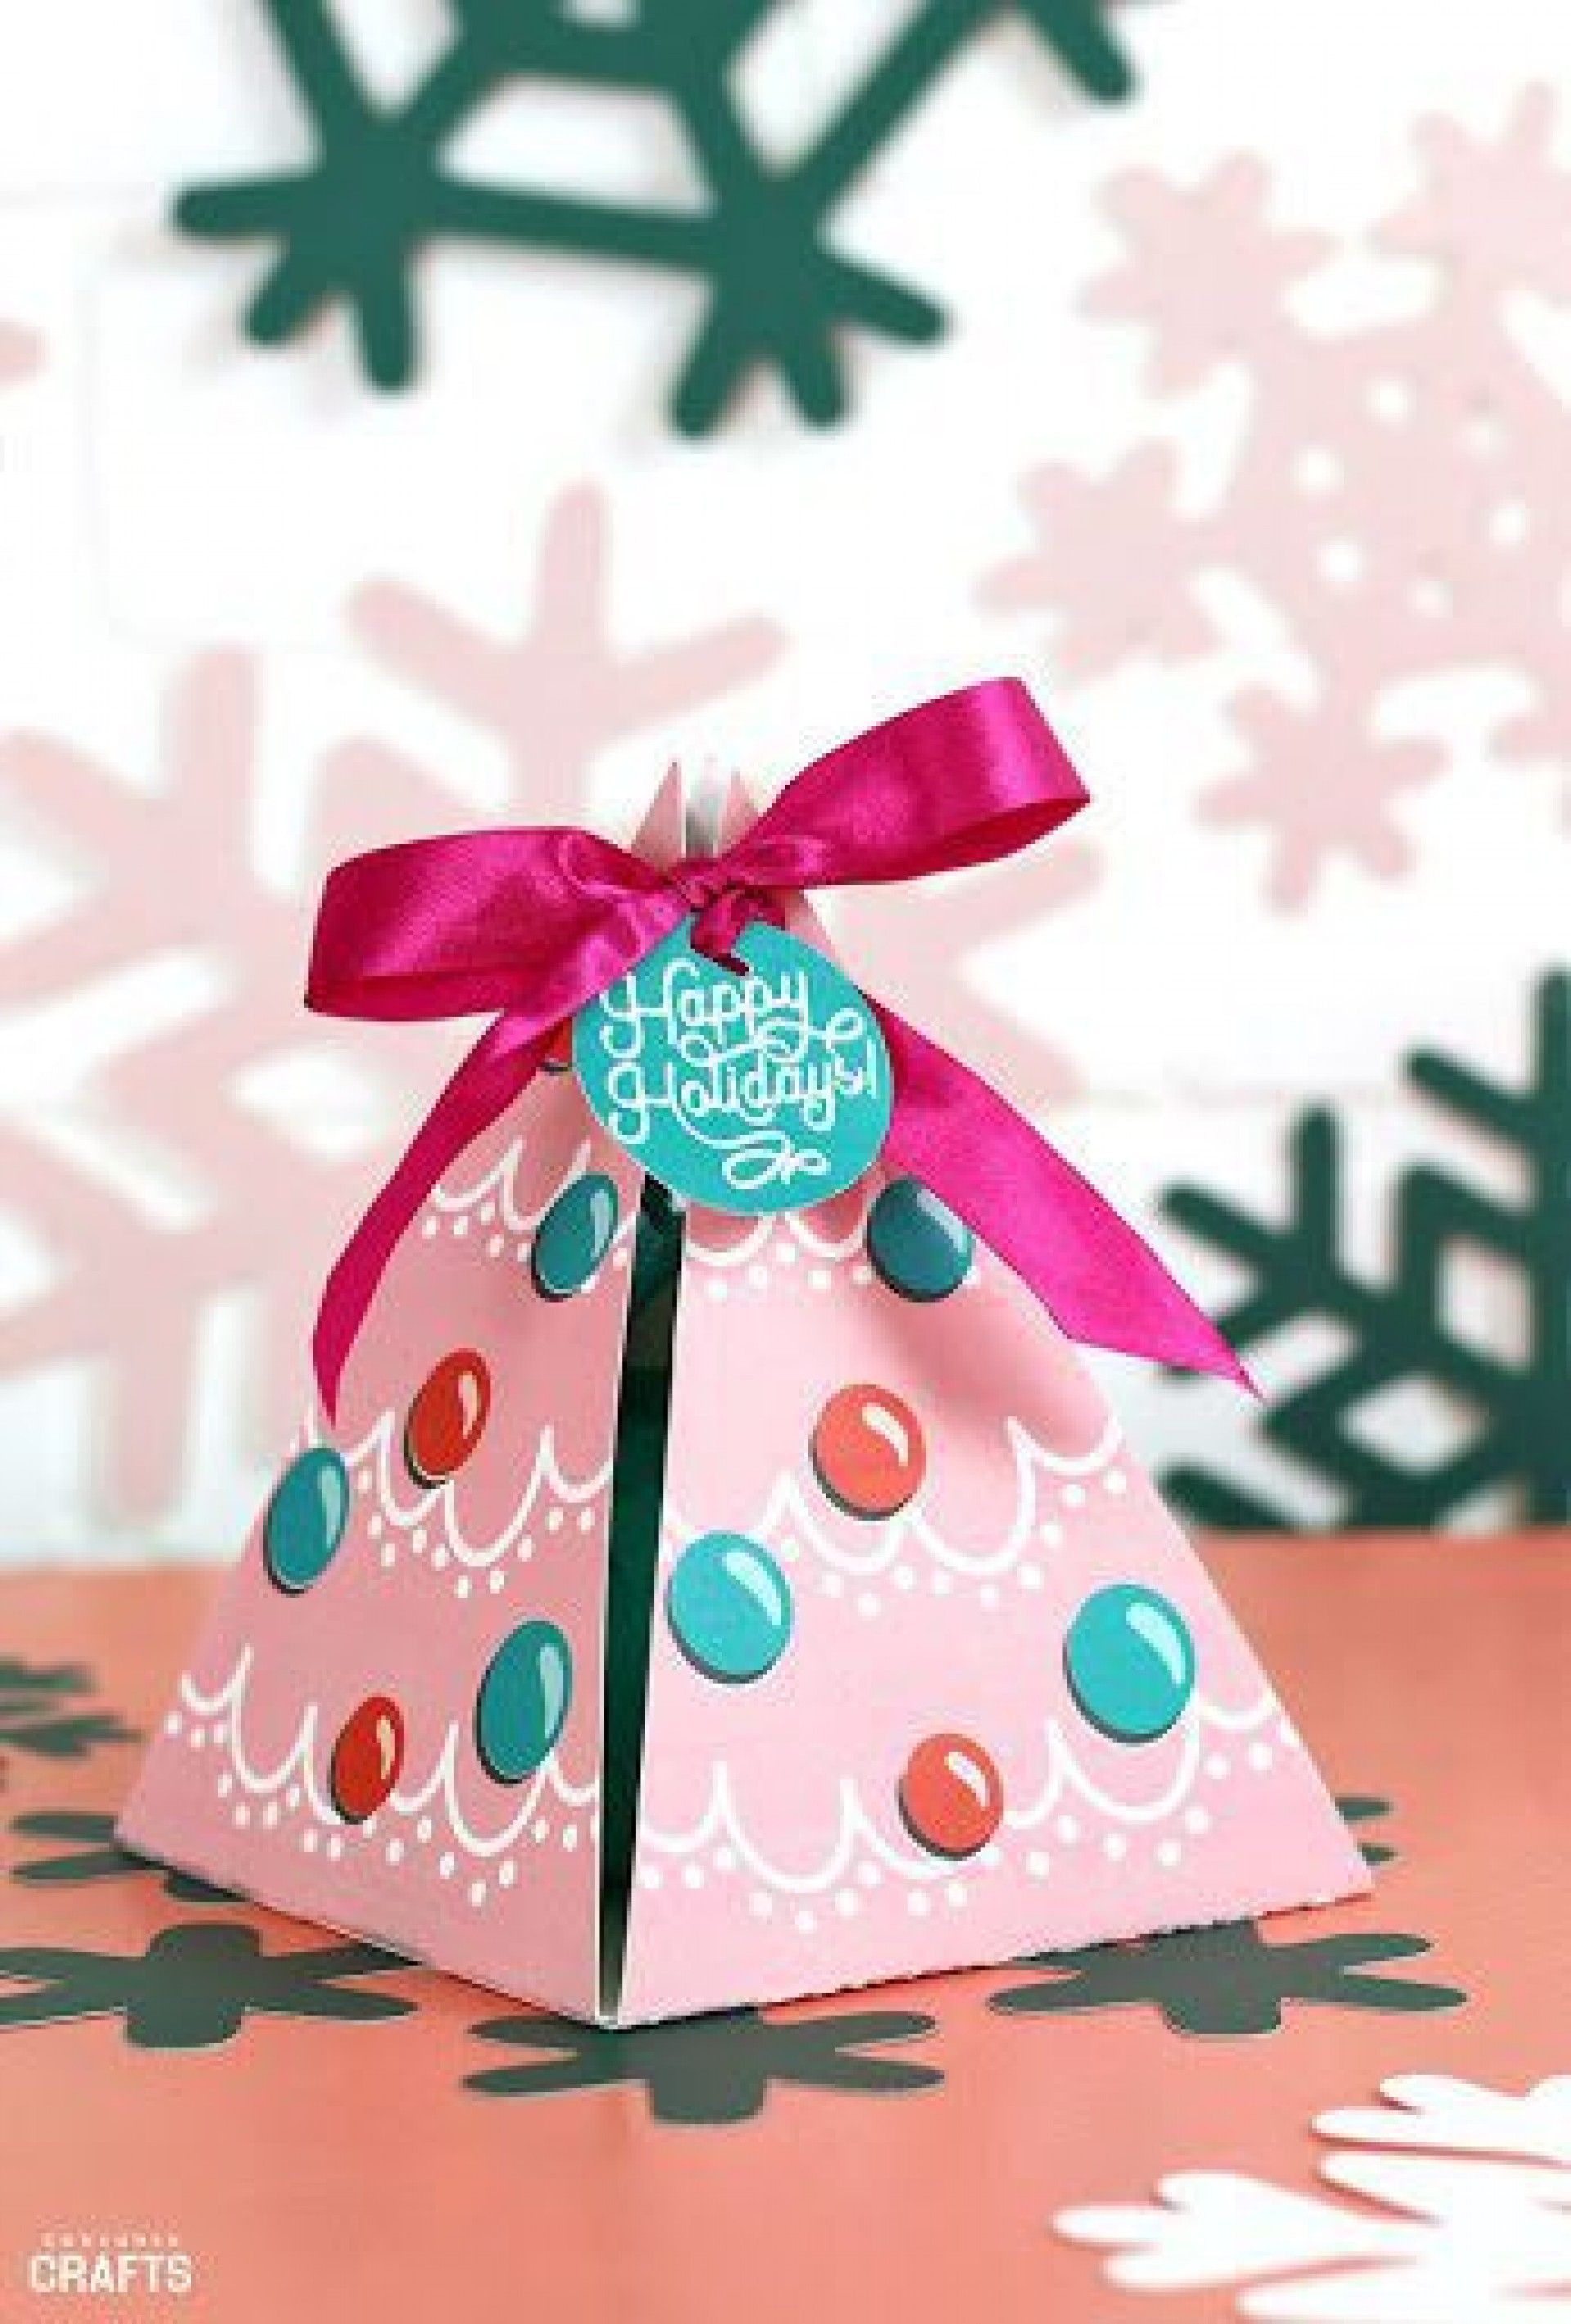 008 Marvelou Christma Gift Box Template Free Printable Concept  Tree1920